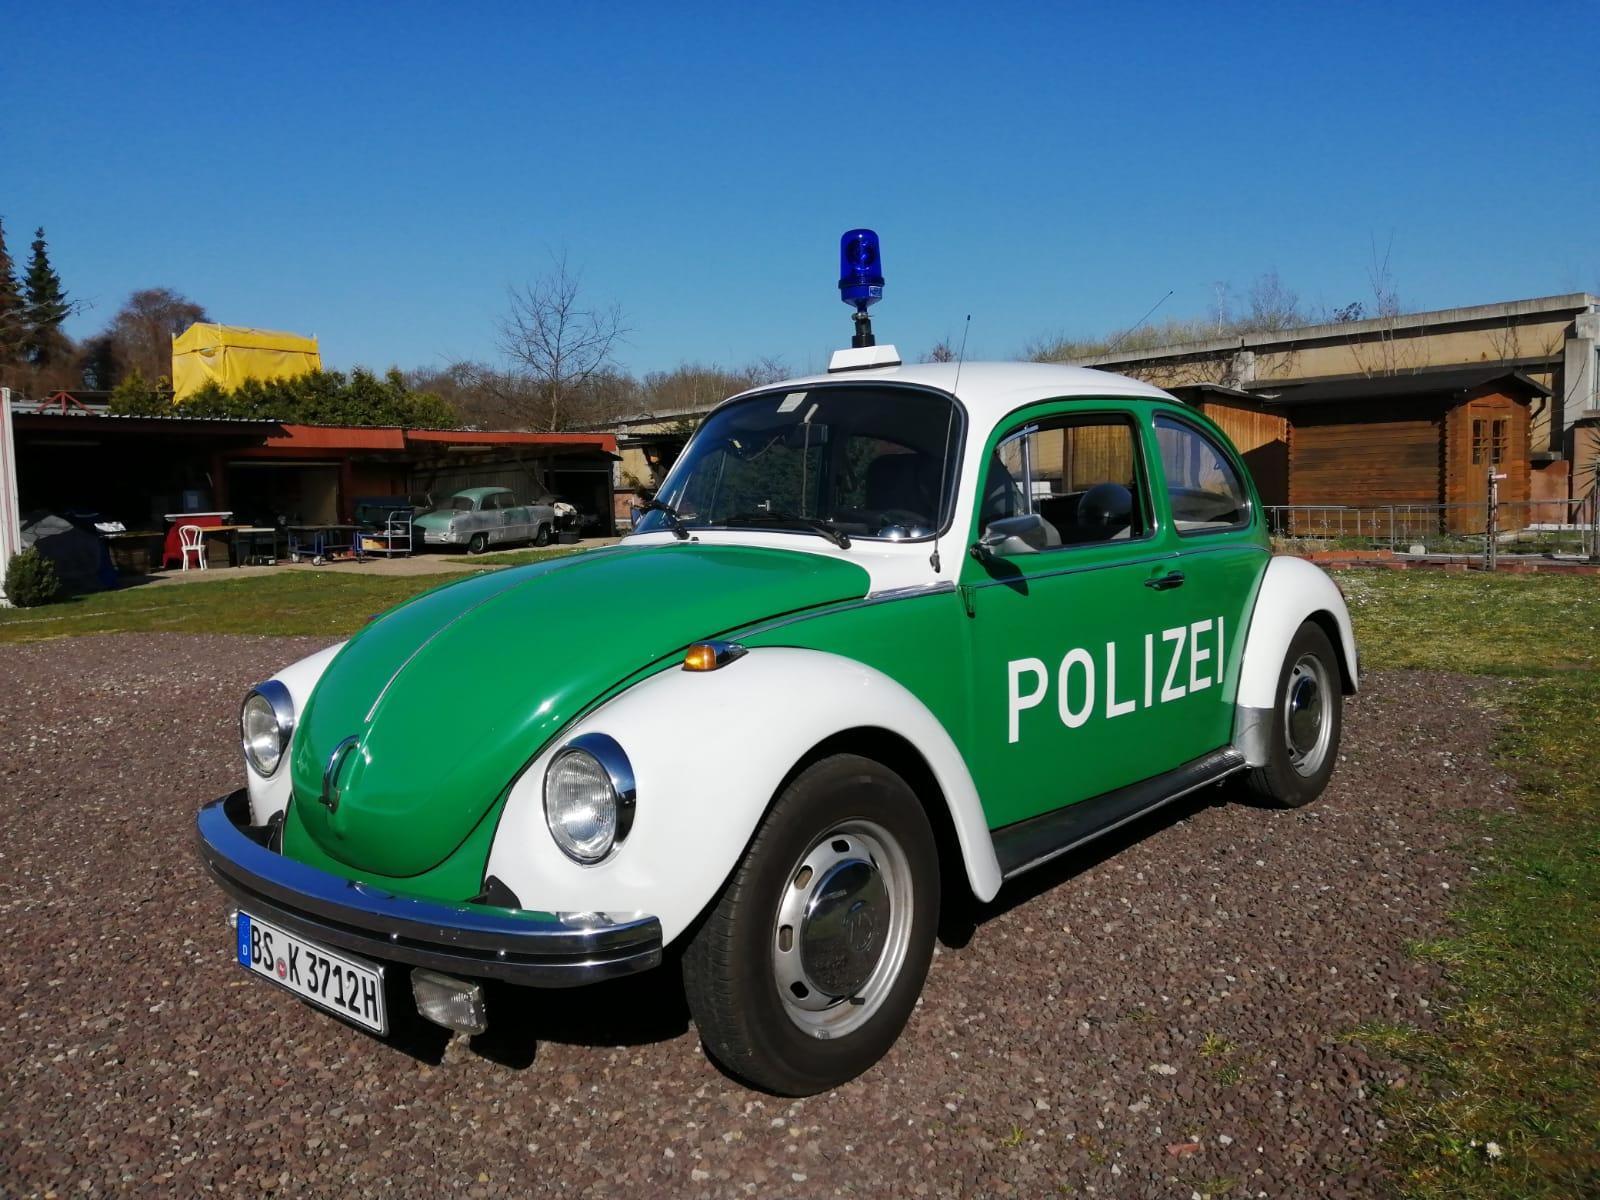 historische-fahrzeuge-bs.de - automuseum-braunschweig.de